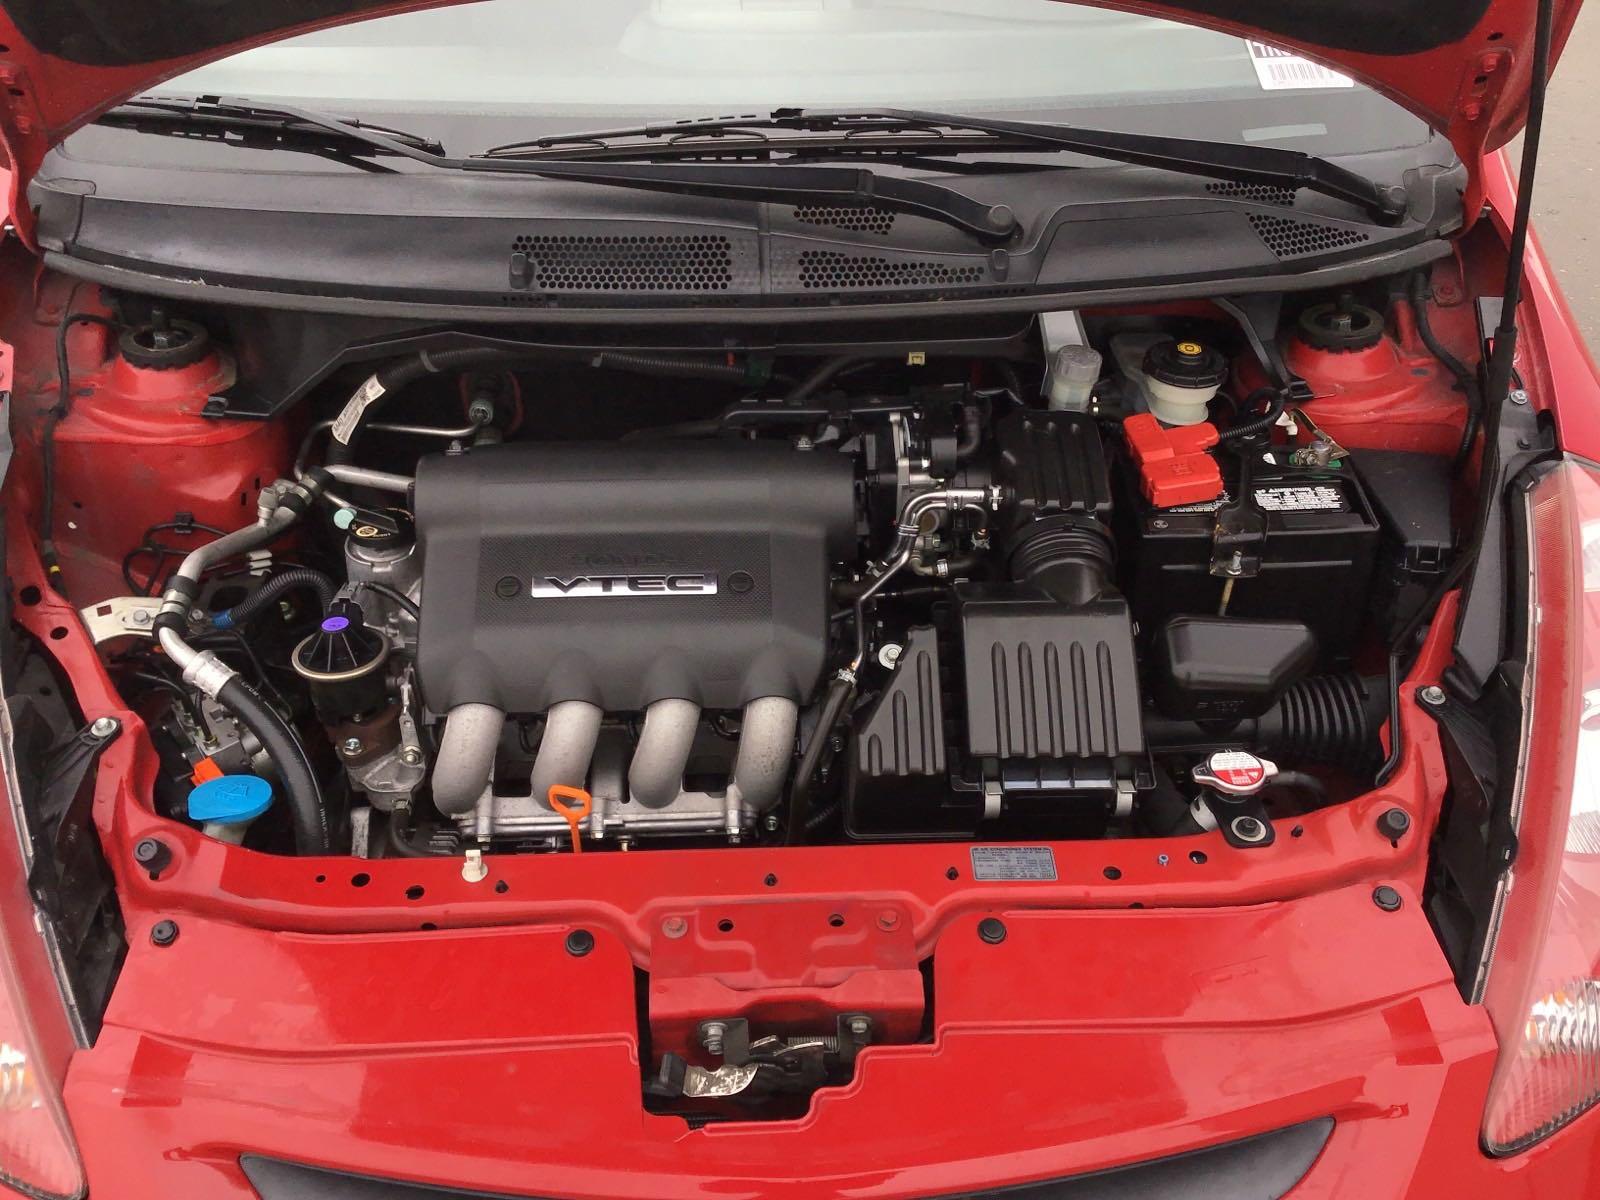 Pre-Owned 2008 Honda Fit Sport